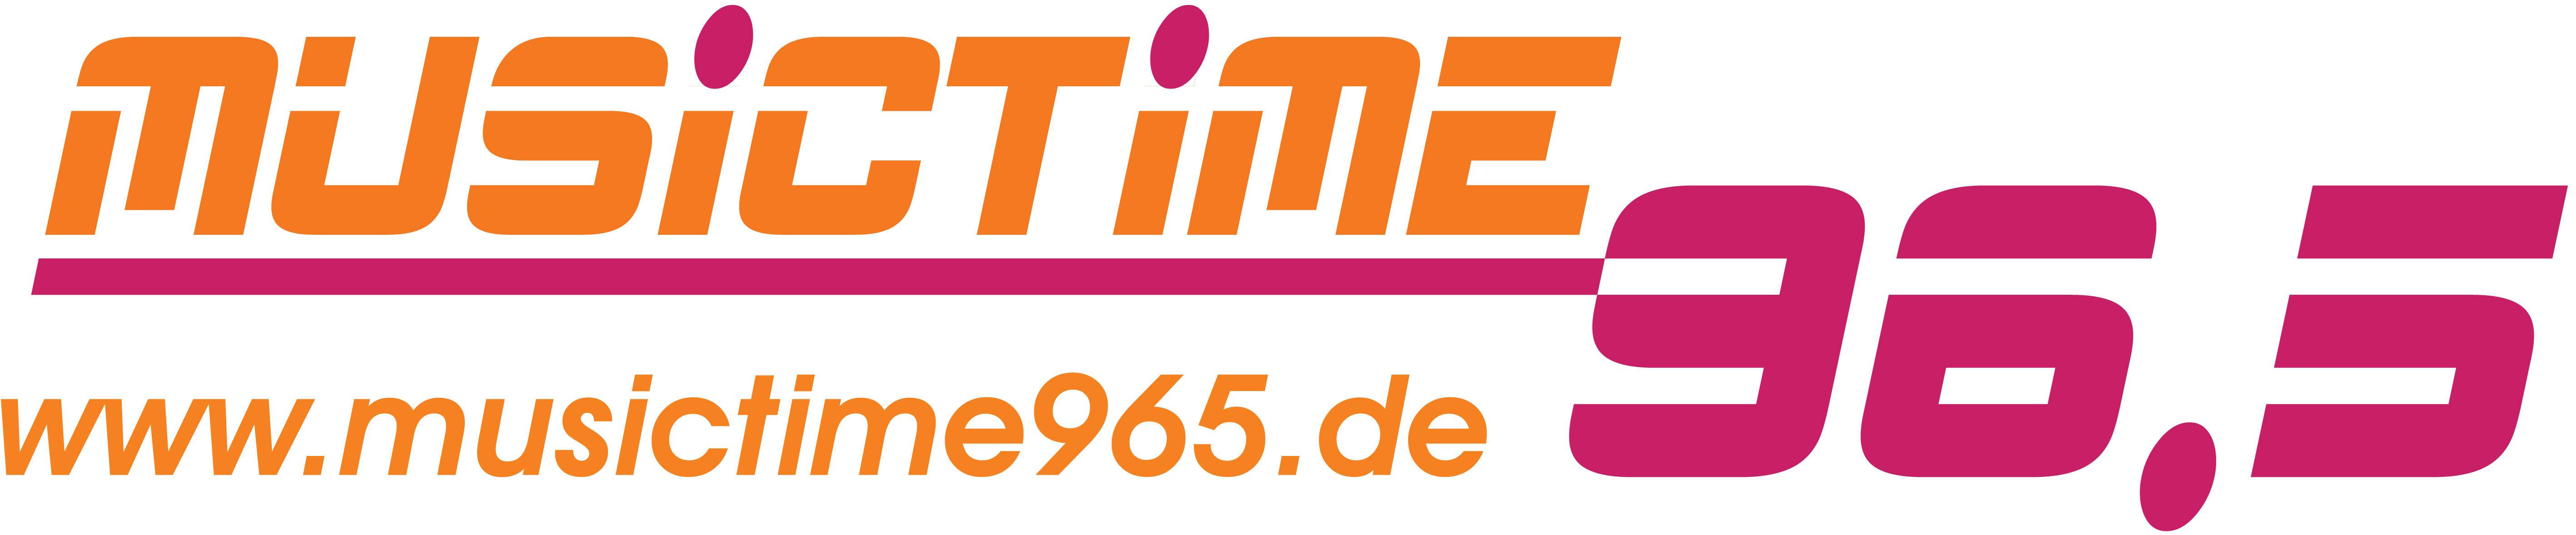 musictime965.de - Musictime für 96,5